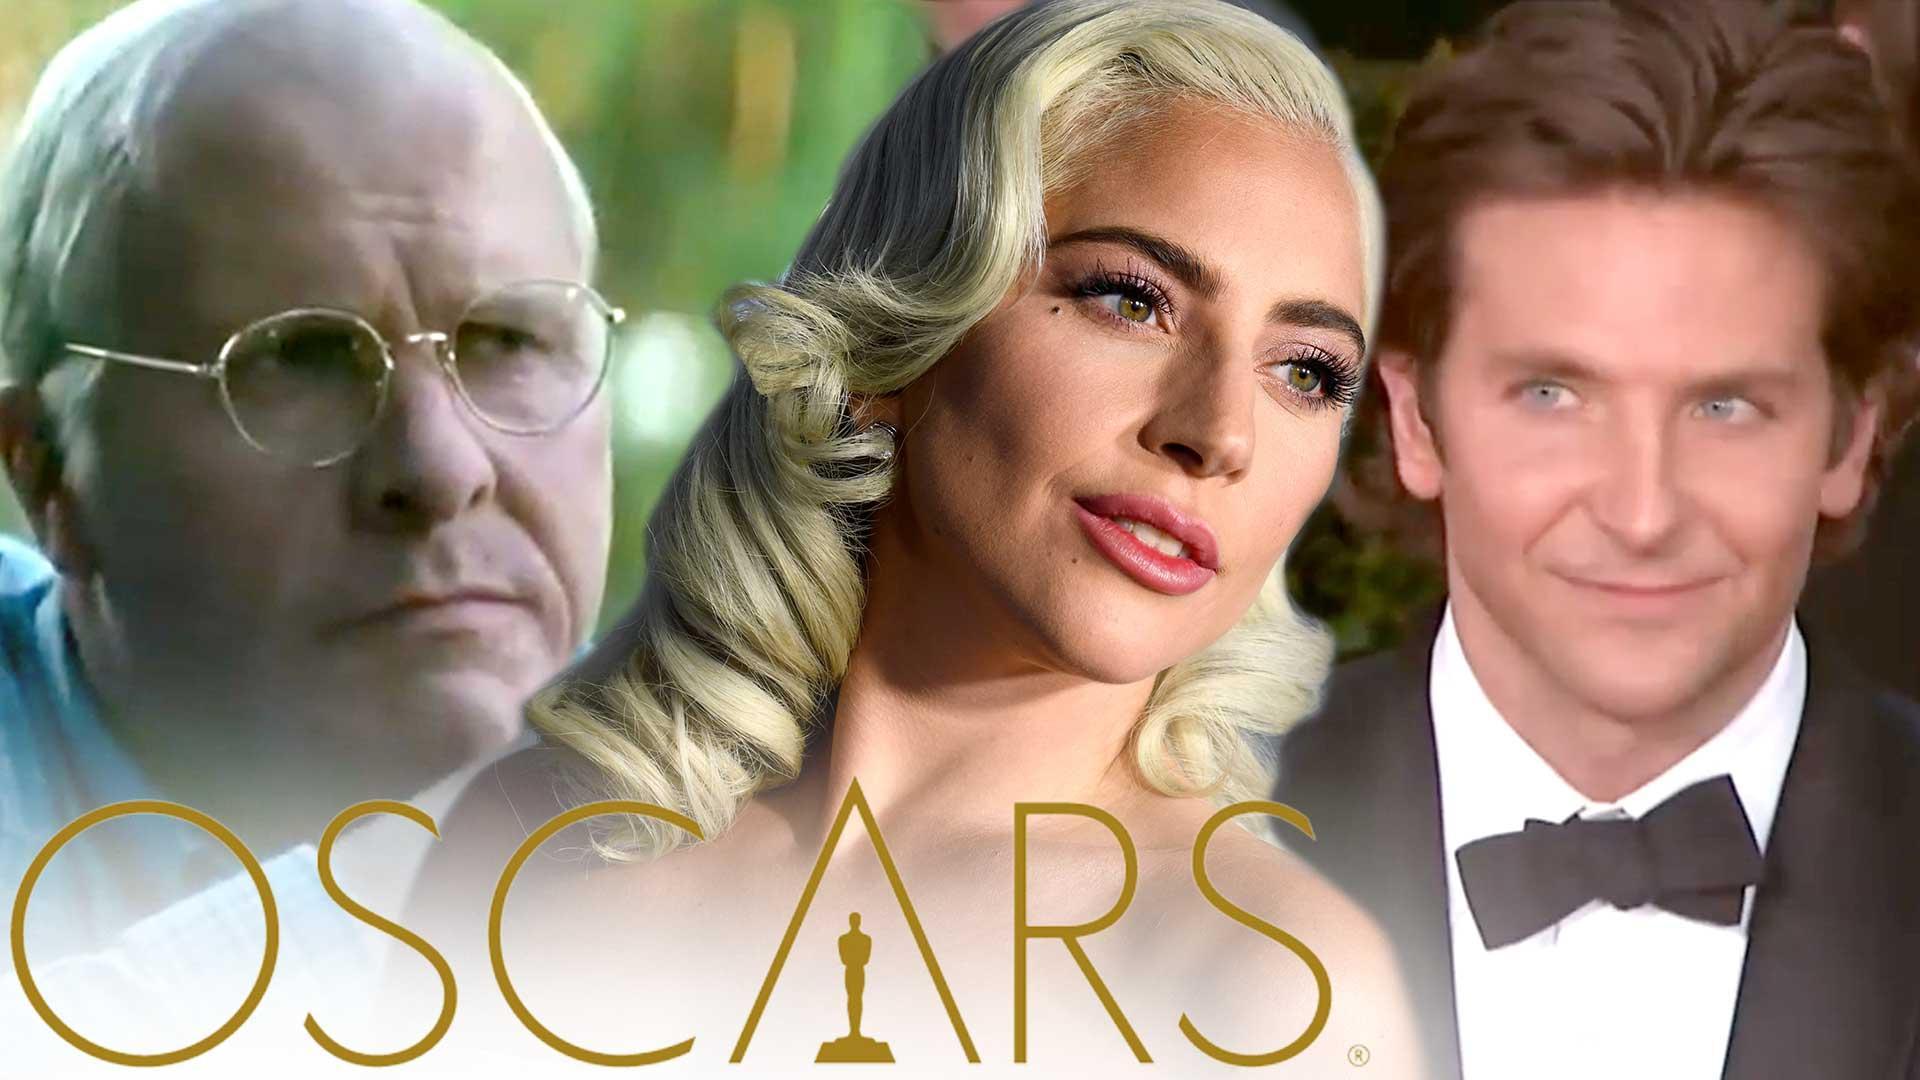 Oscar Nominations 2019: The Complete List | Entertainment